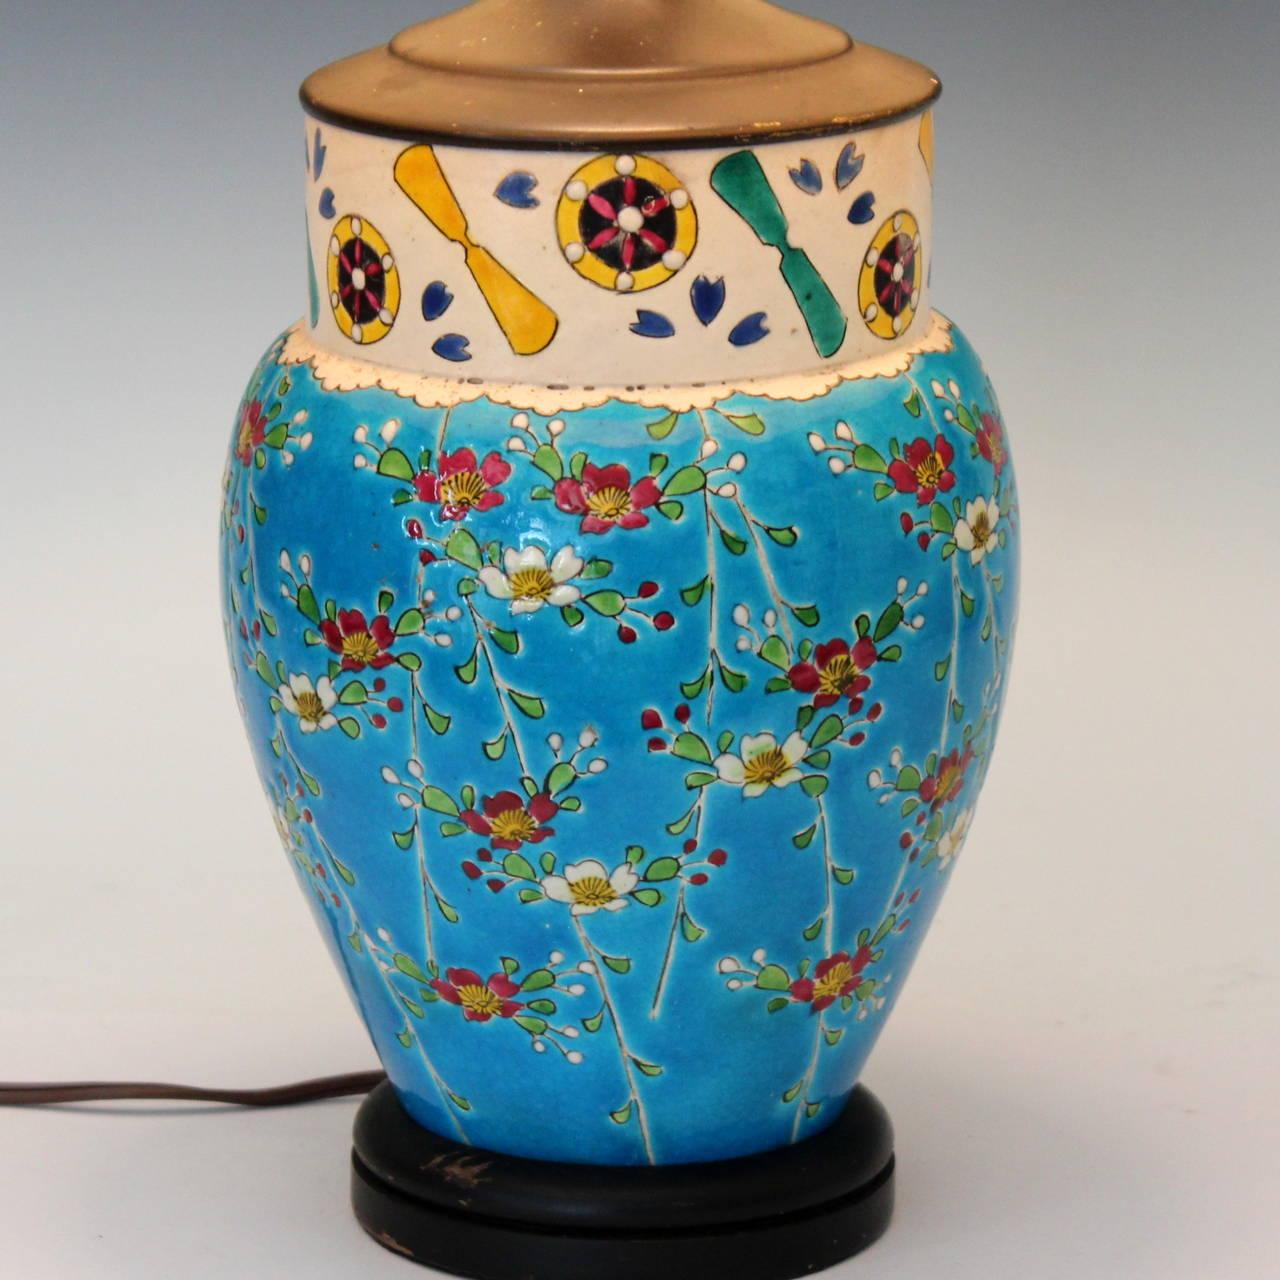 Antique Japanese Enameled Pottery Turquoise Buddhist Lamp At 1stdibs